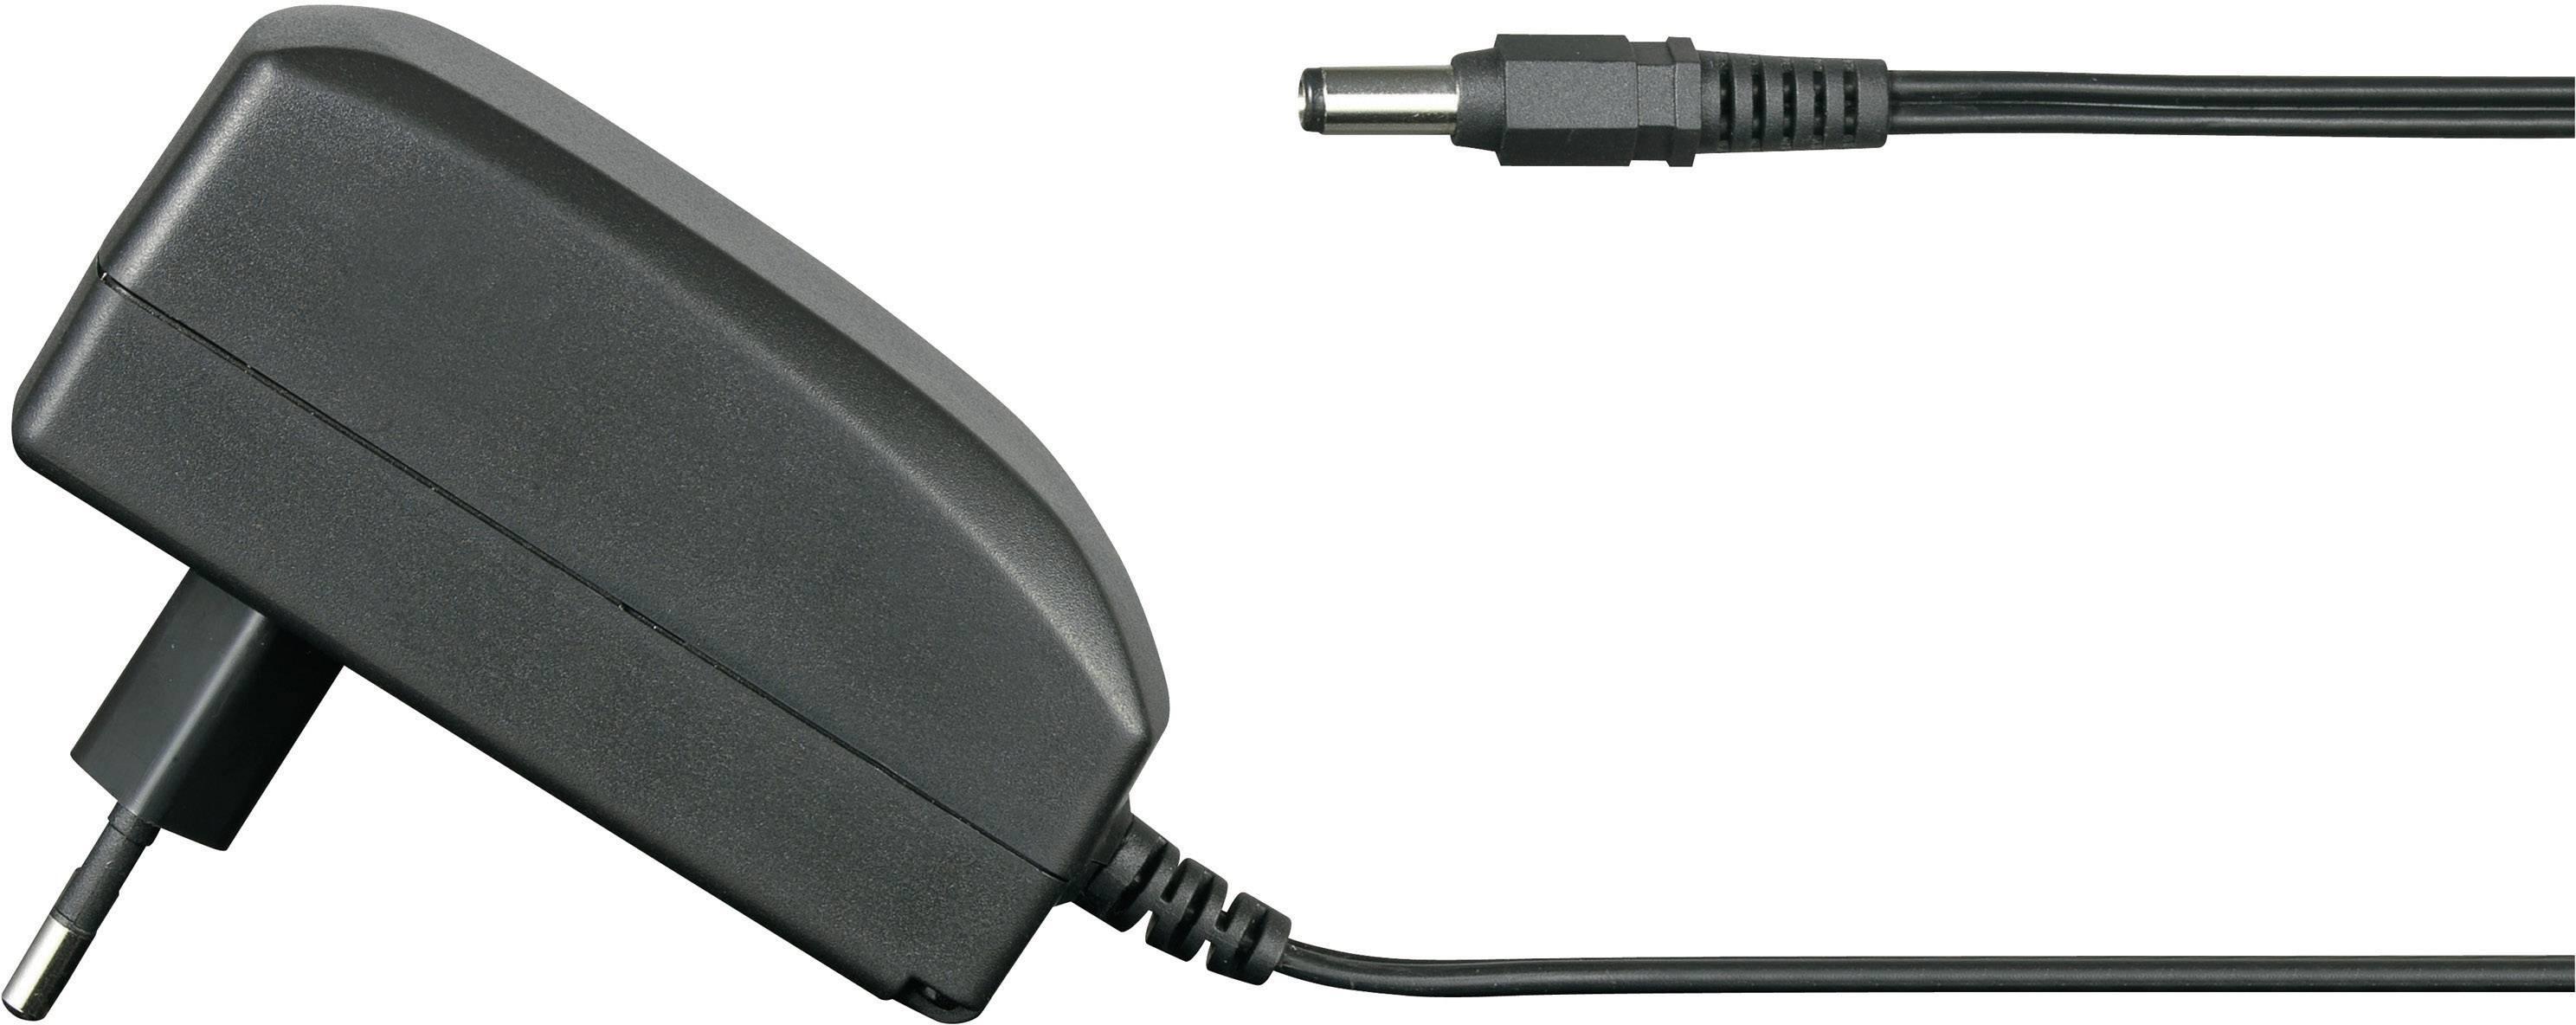 Síťový adaptér Voltcraft FPPS 18-27W, 18 V/DC, 27 W